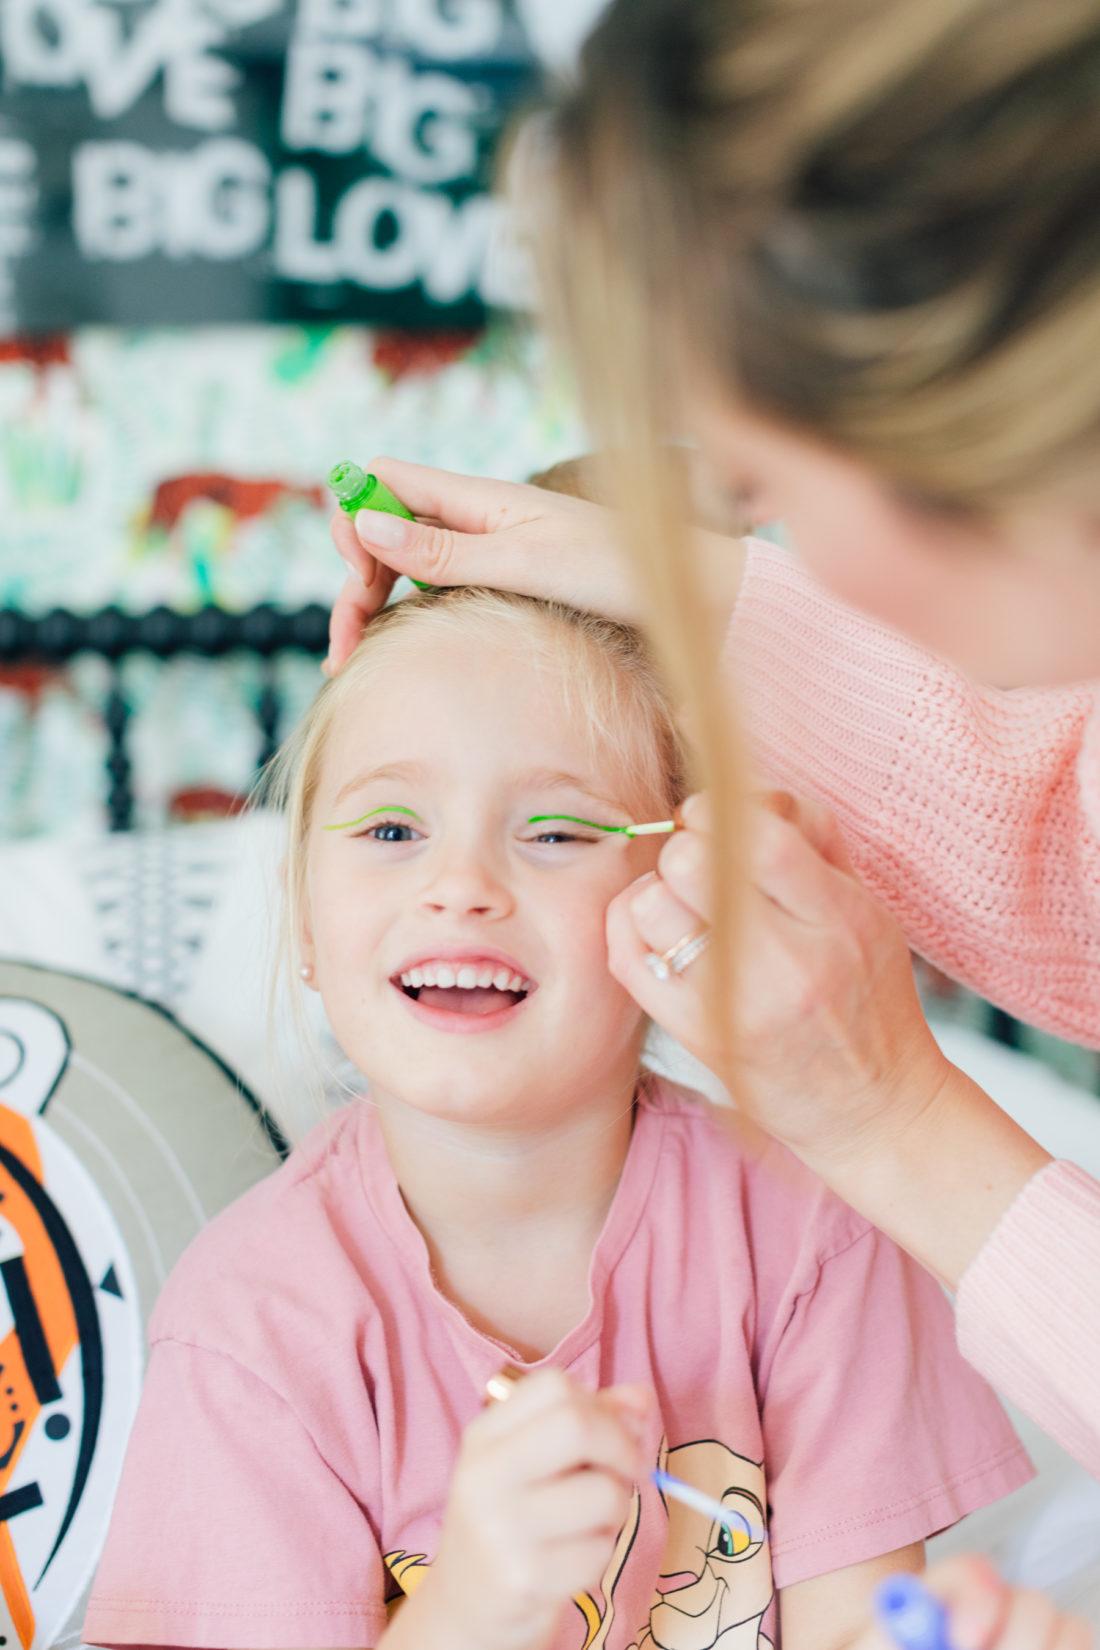 Eva Amurri Martino paints some neon eyeliner on daughter Marlowe